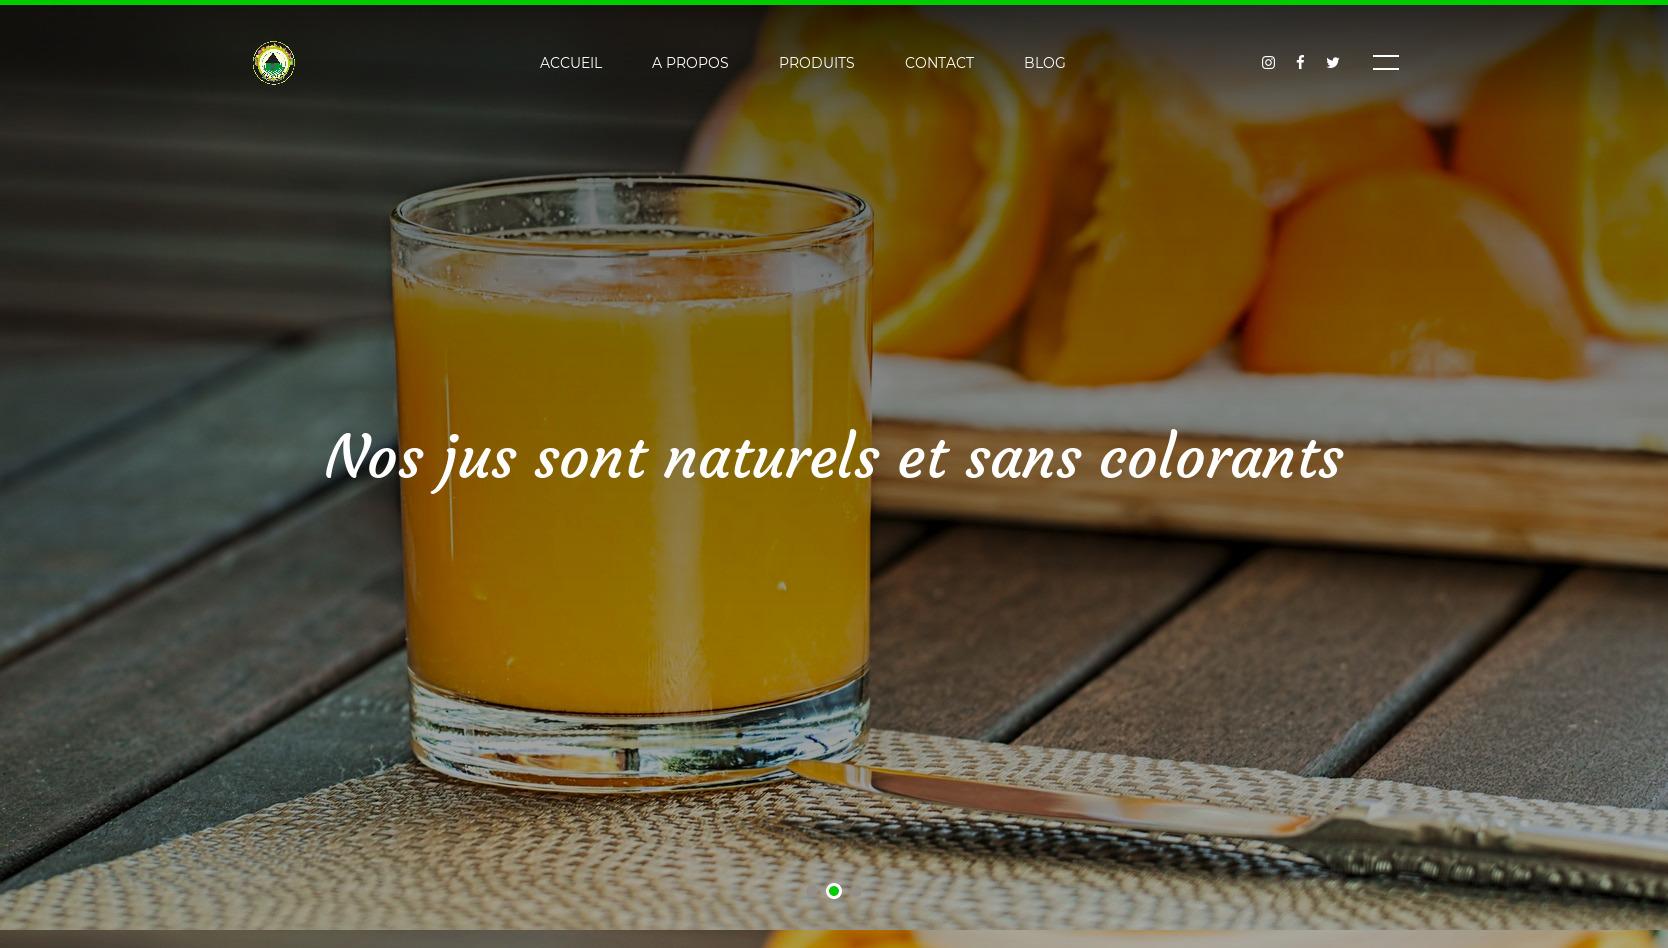 Buguni's website